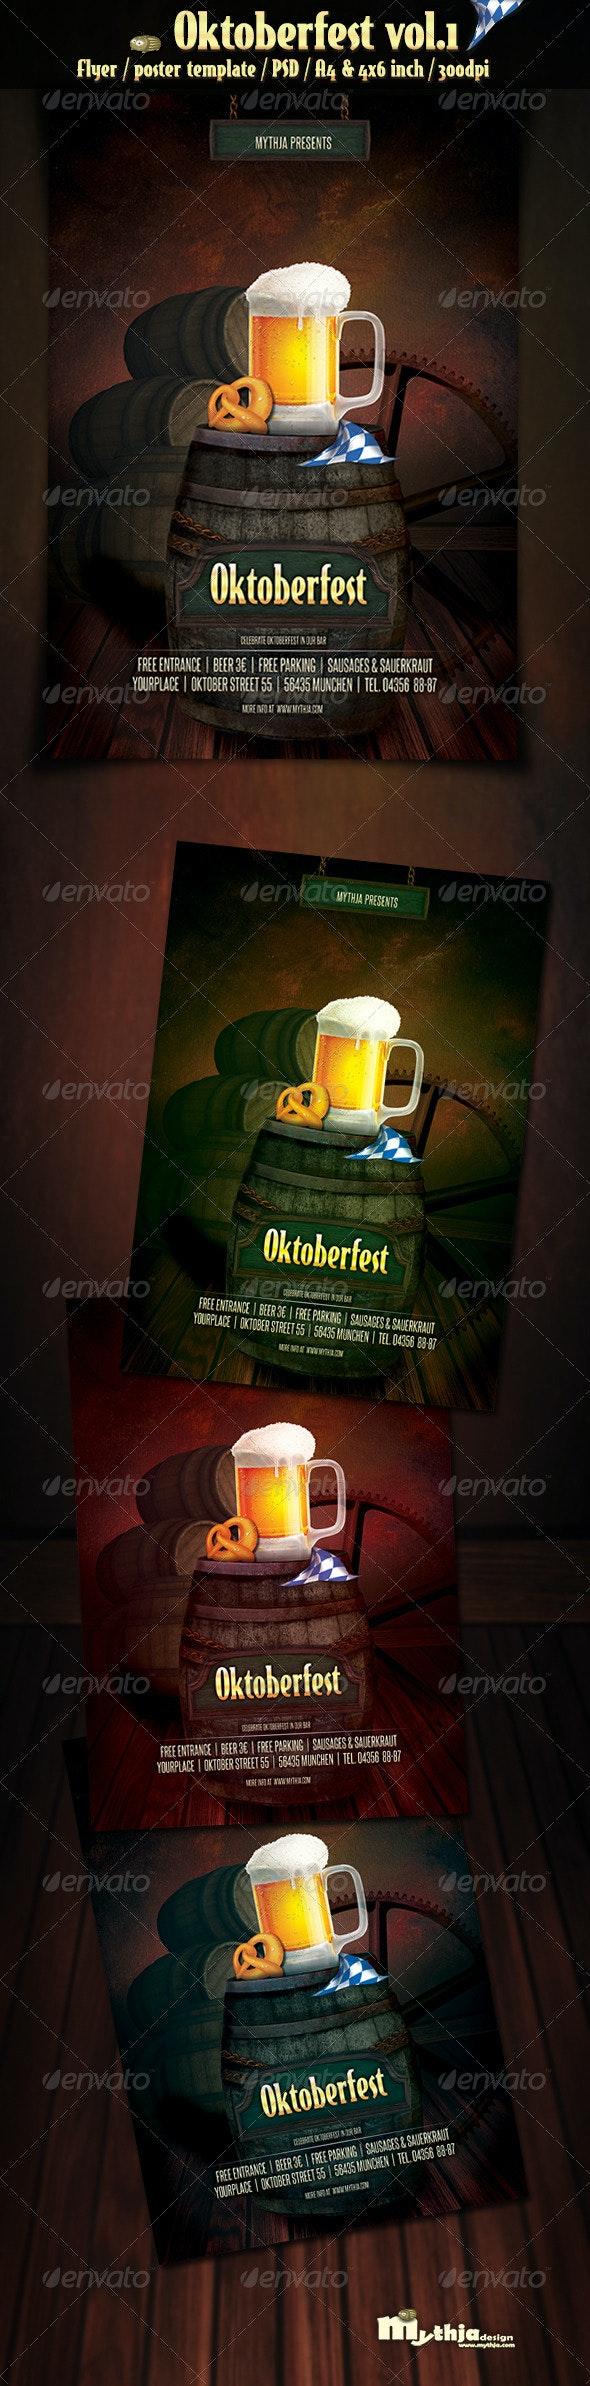 Oktoberfest Vol.1 - Party Flyer/Poster - Clubs & Parties Events